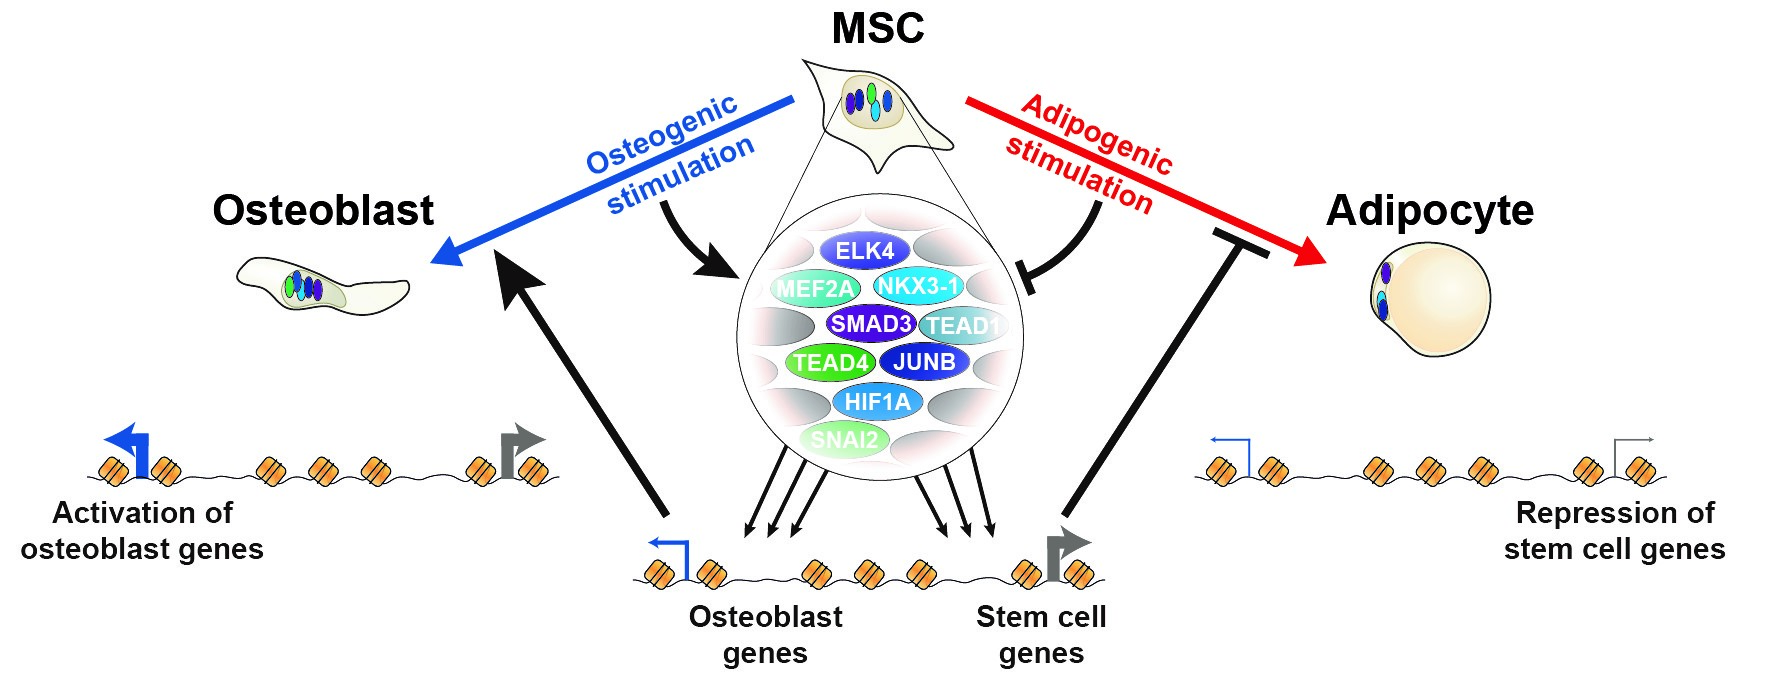 OsteoblastVSAdipocyte